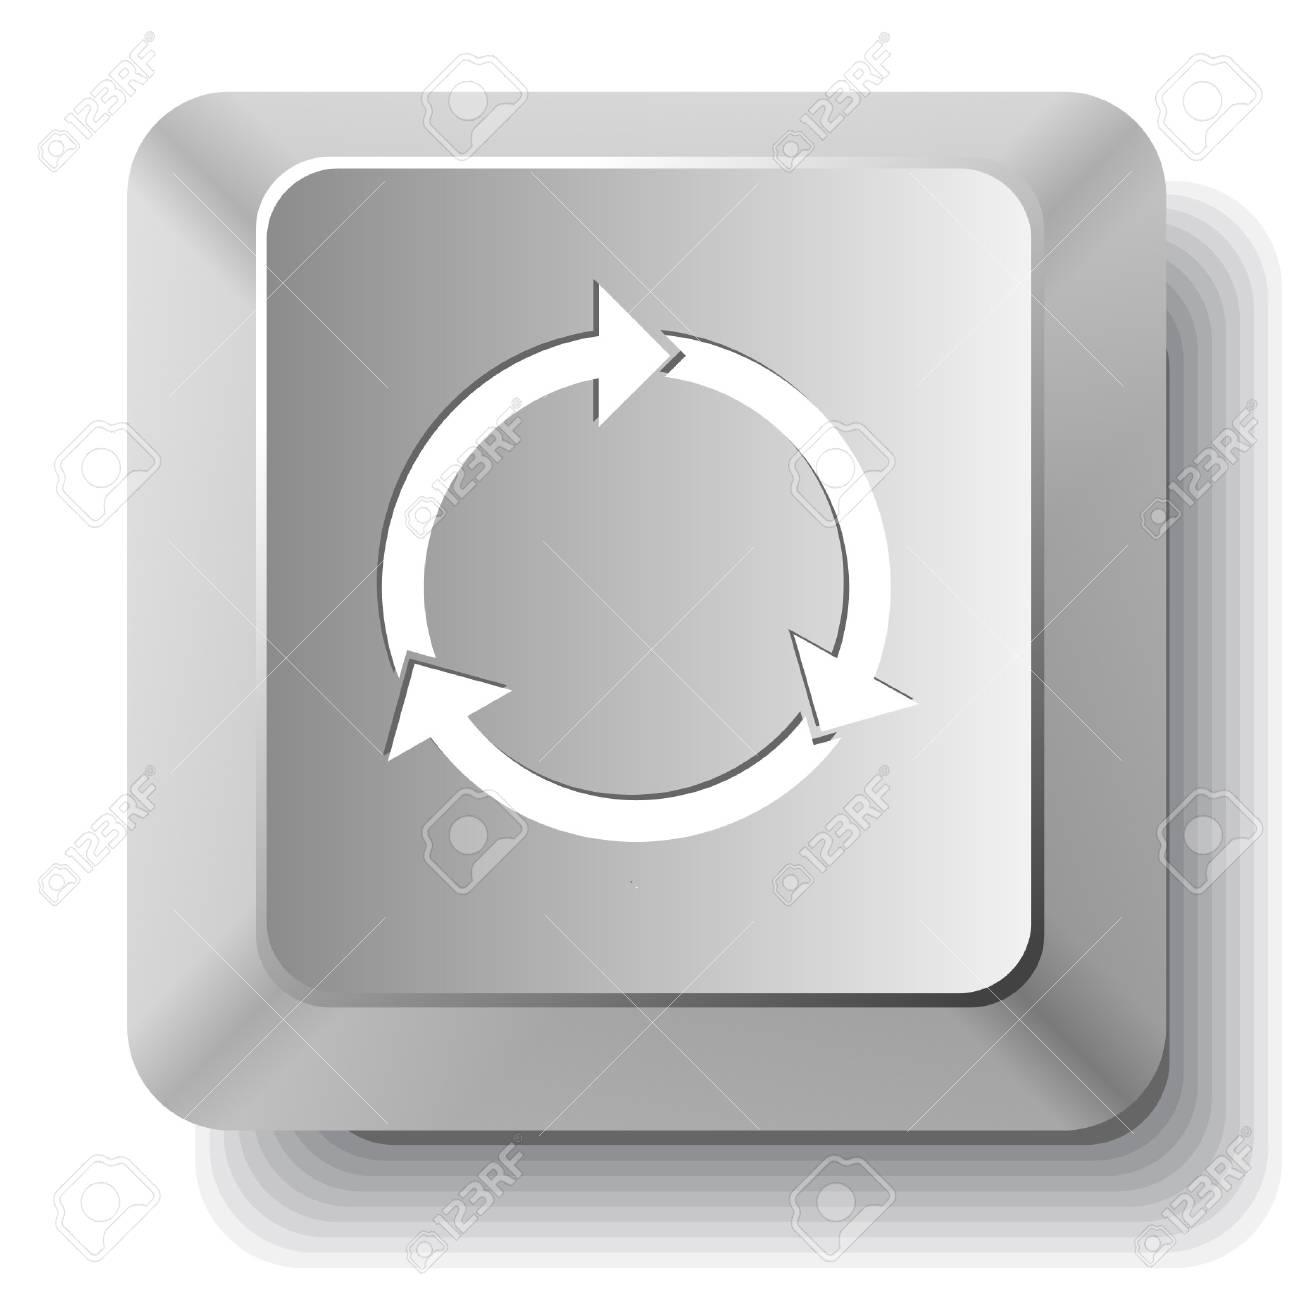 Recycle symbol. computer key. Stock Vector - 7522796